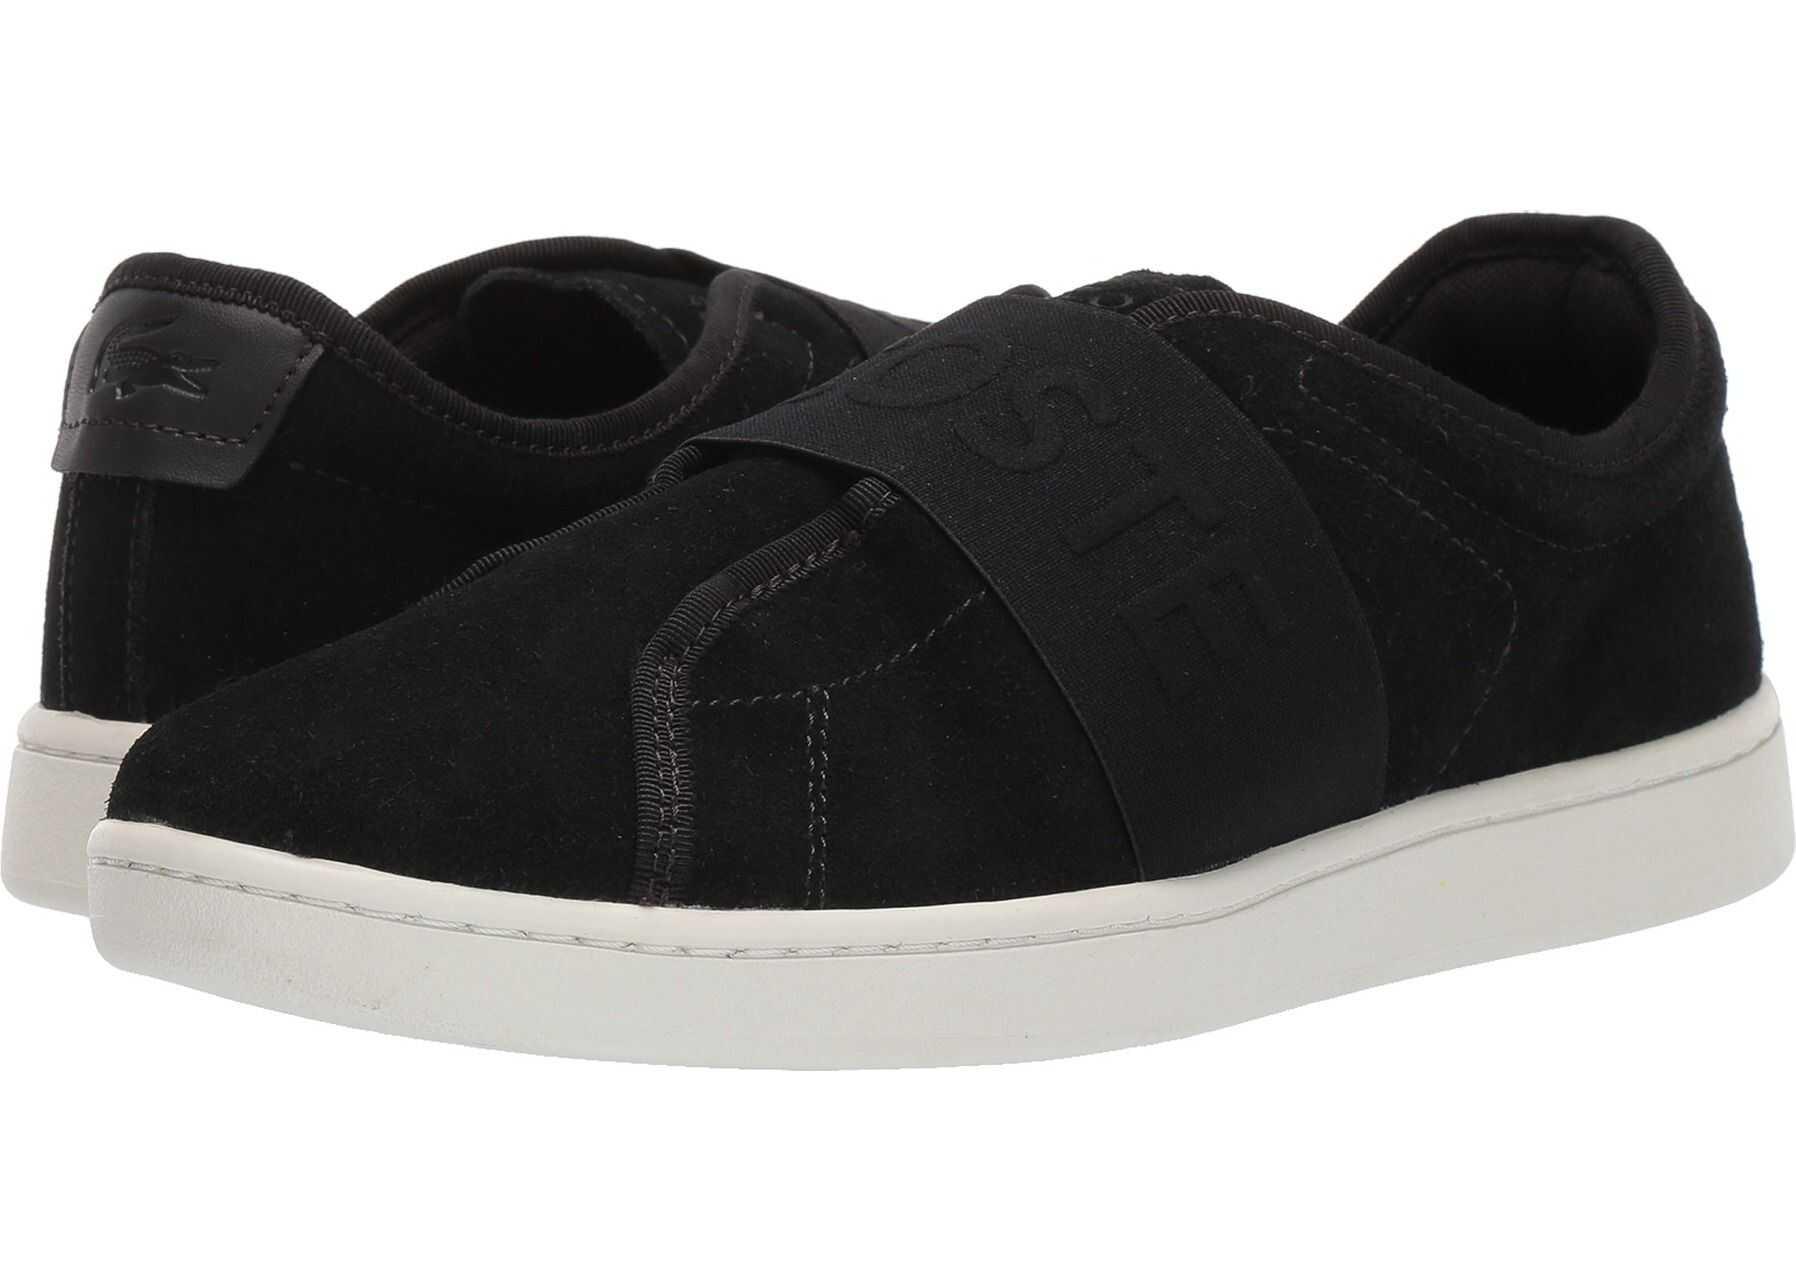 Lacoste Carnaby Evo Slip 318 2 Black/Off-White